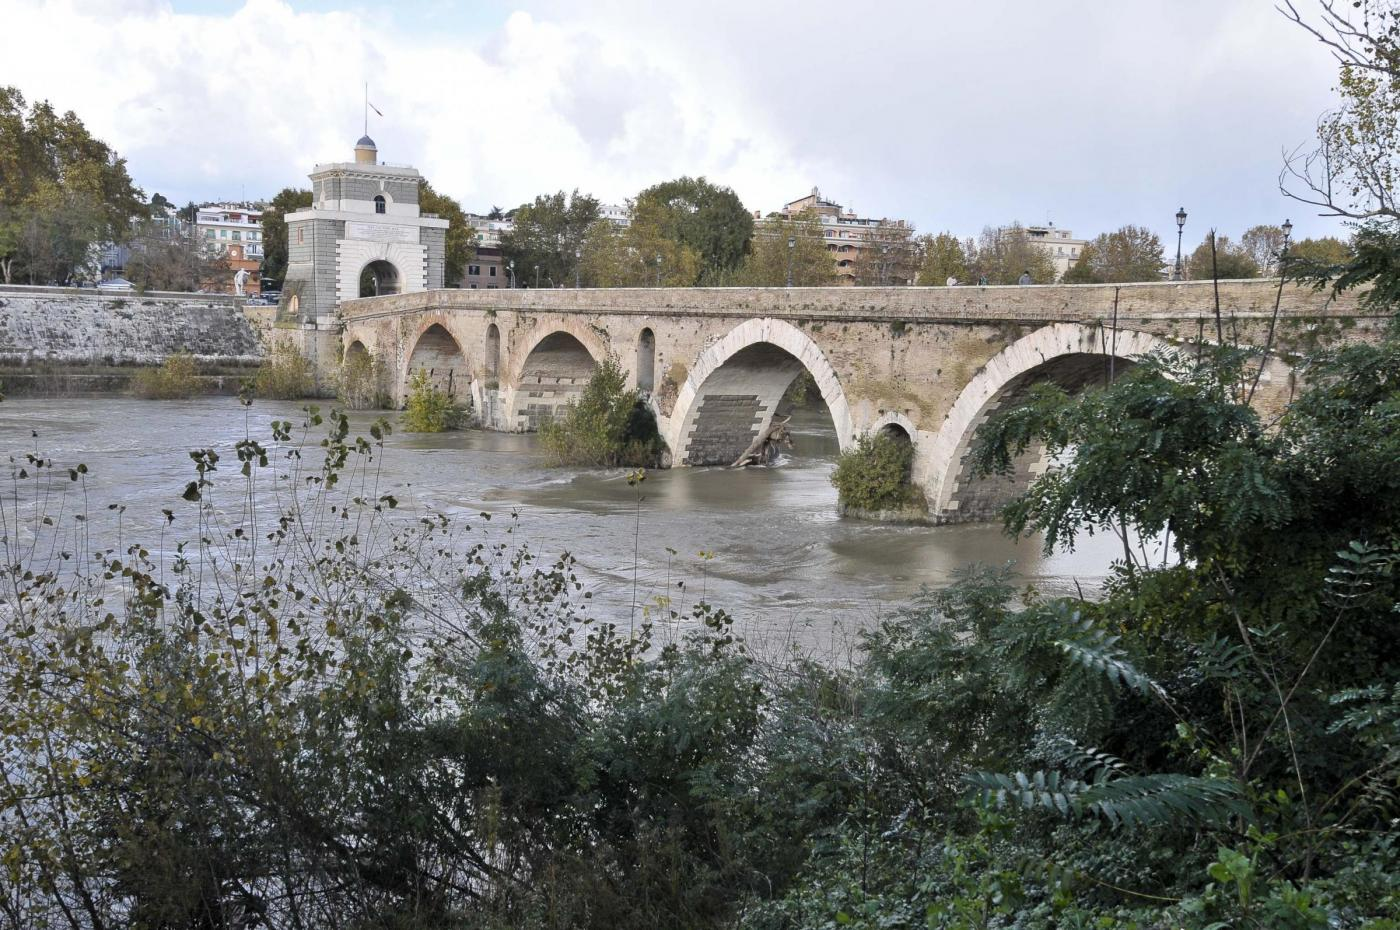 fiume tevere, roma